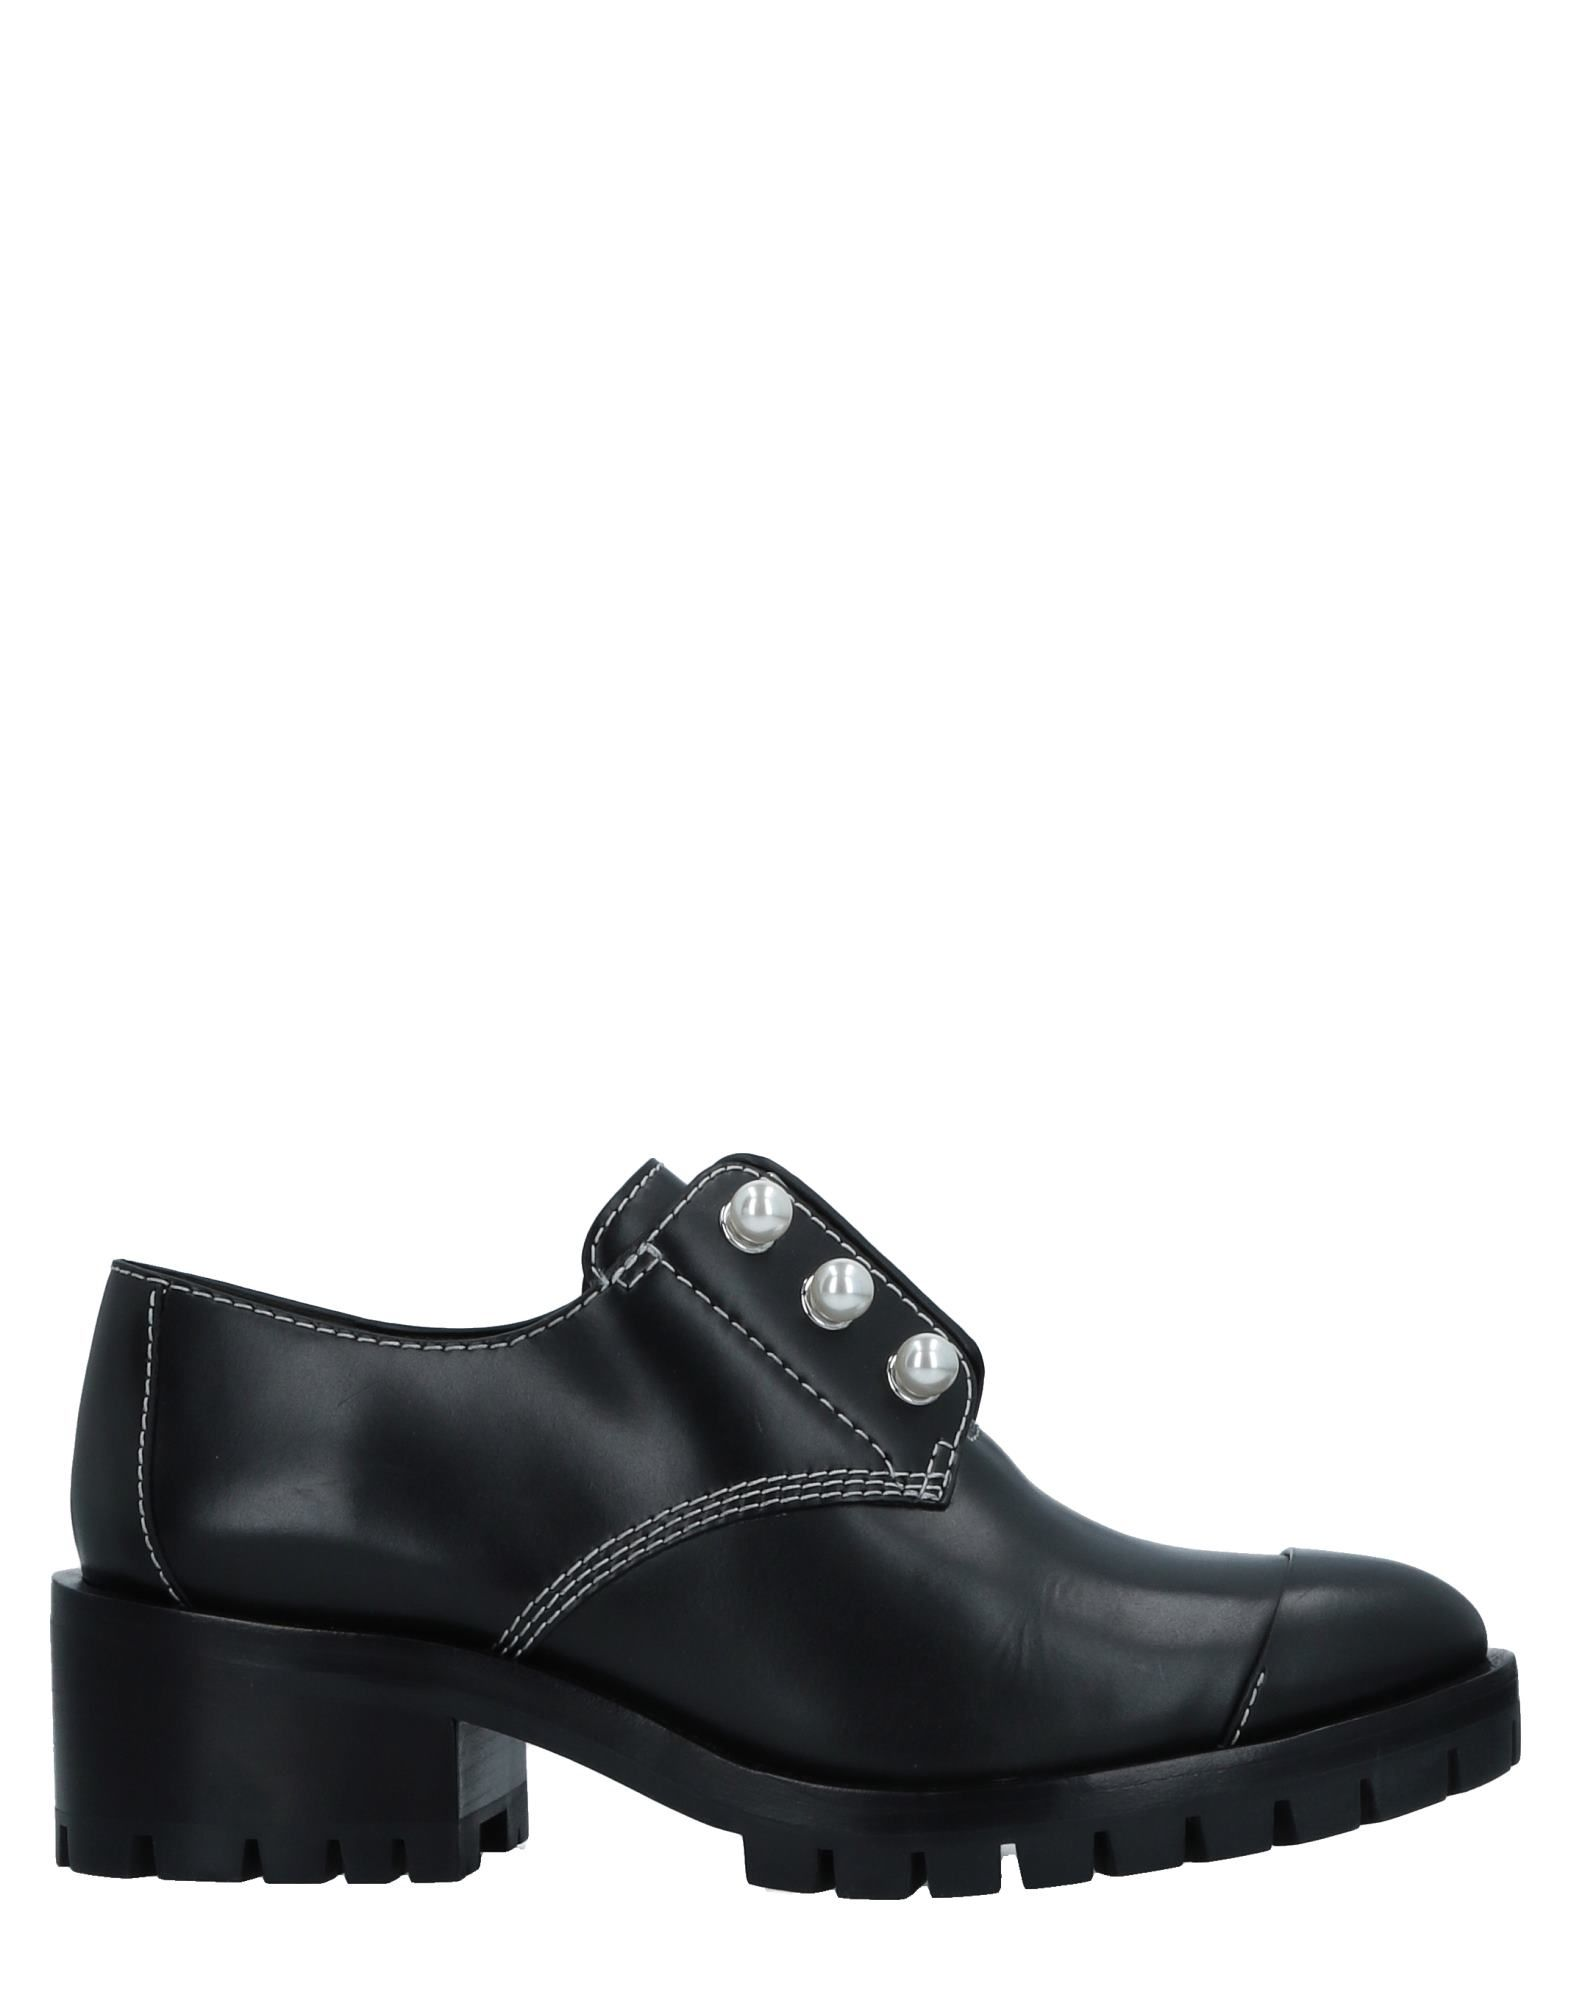 Stilvolle billige Schuhe 3.1 Phillip Lim Mokassins Damen  11515398GV